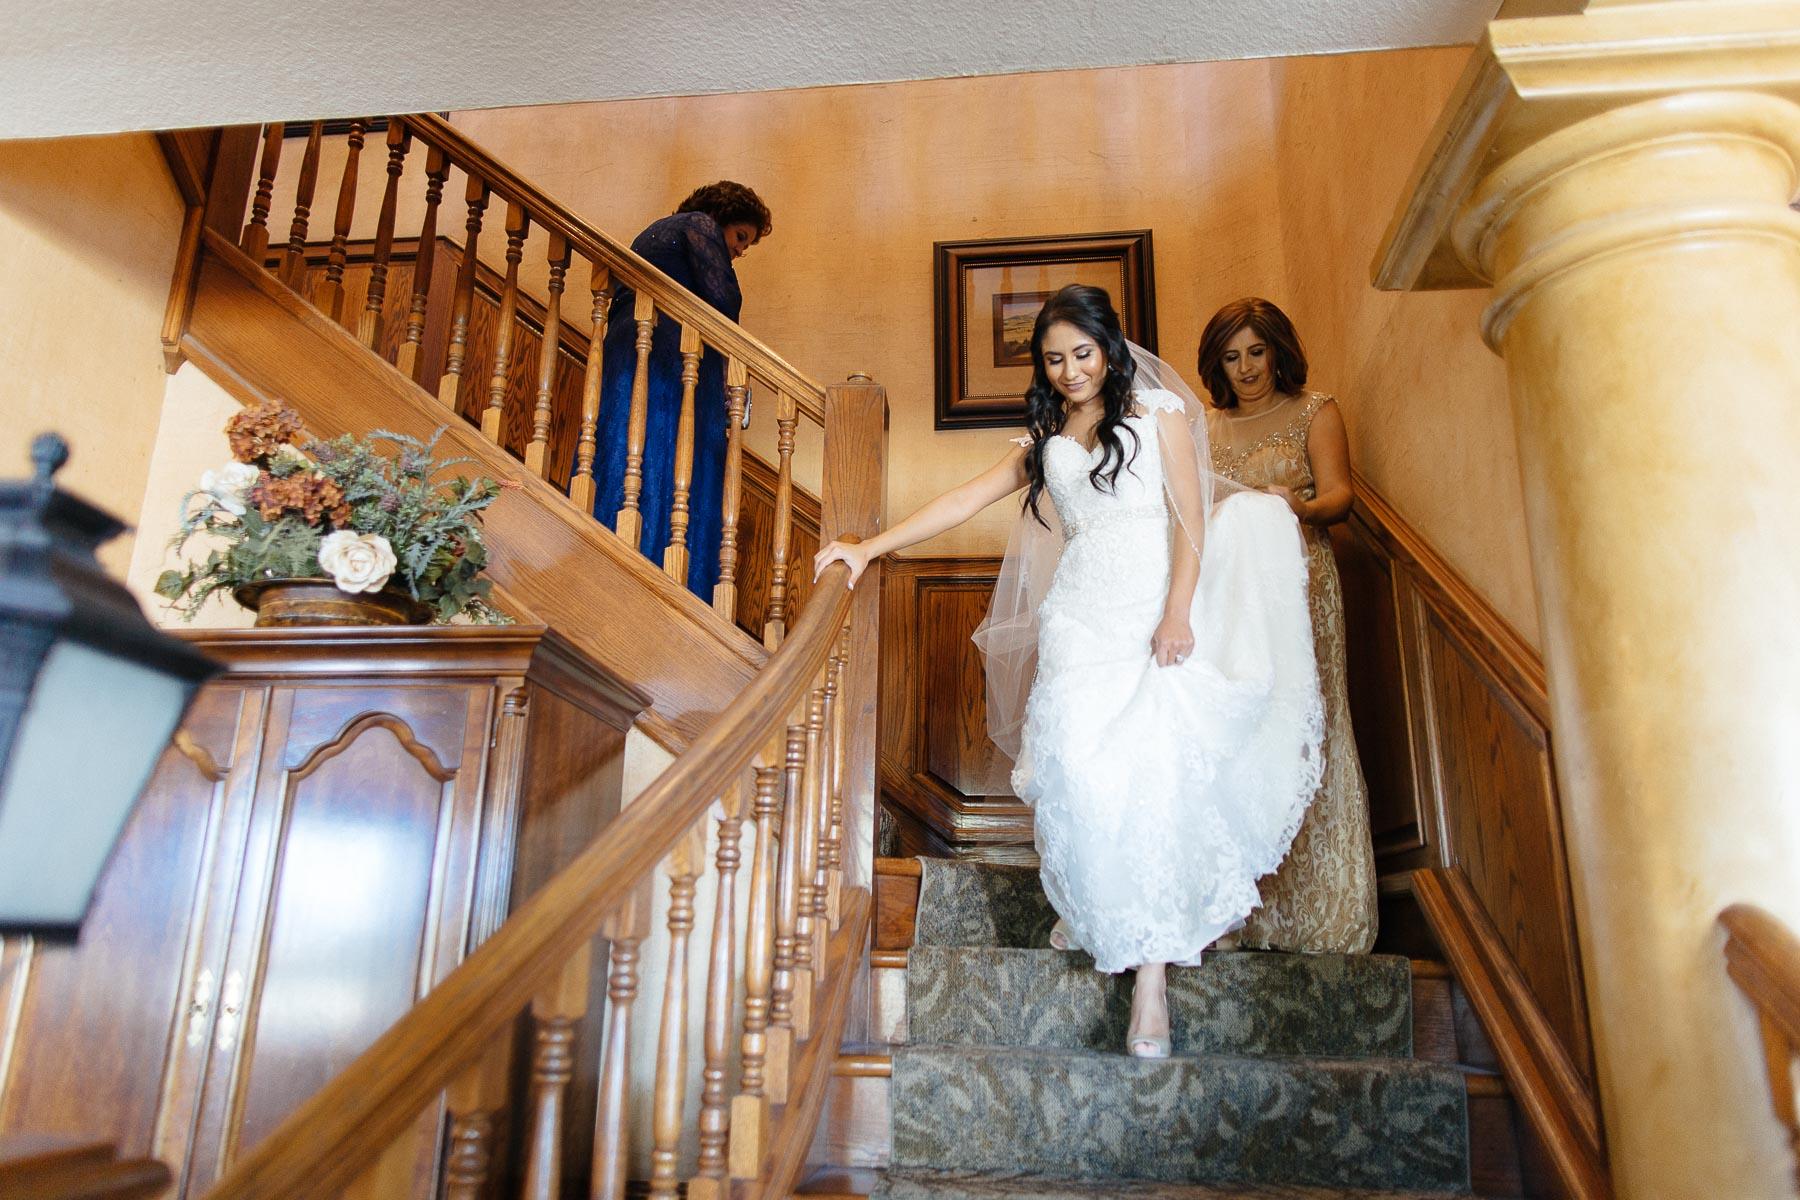 161029-Luxium-Weddings-Arizona-Jeff-Griselda-First-Look-Val-Vista-Lakes-Gilber-028.jpg